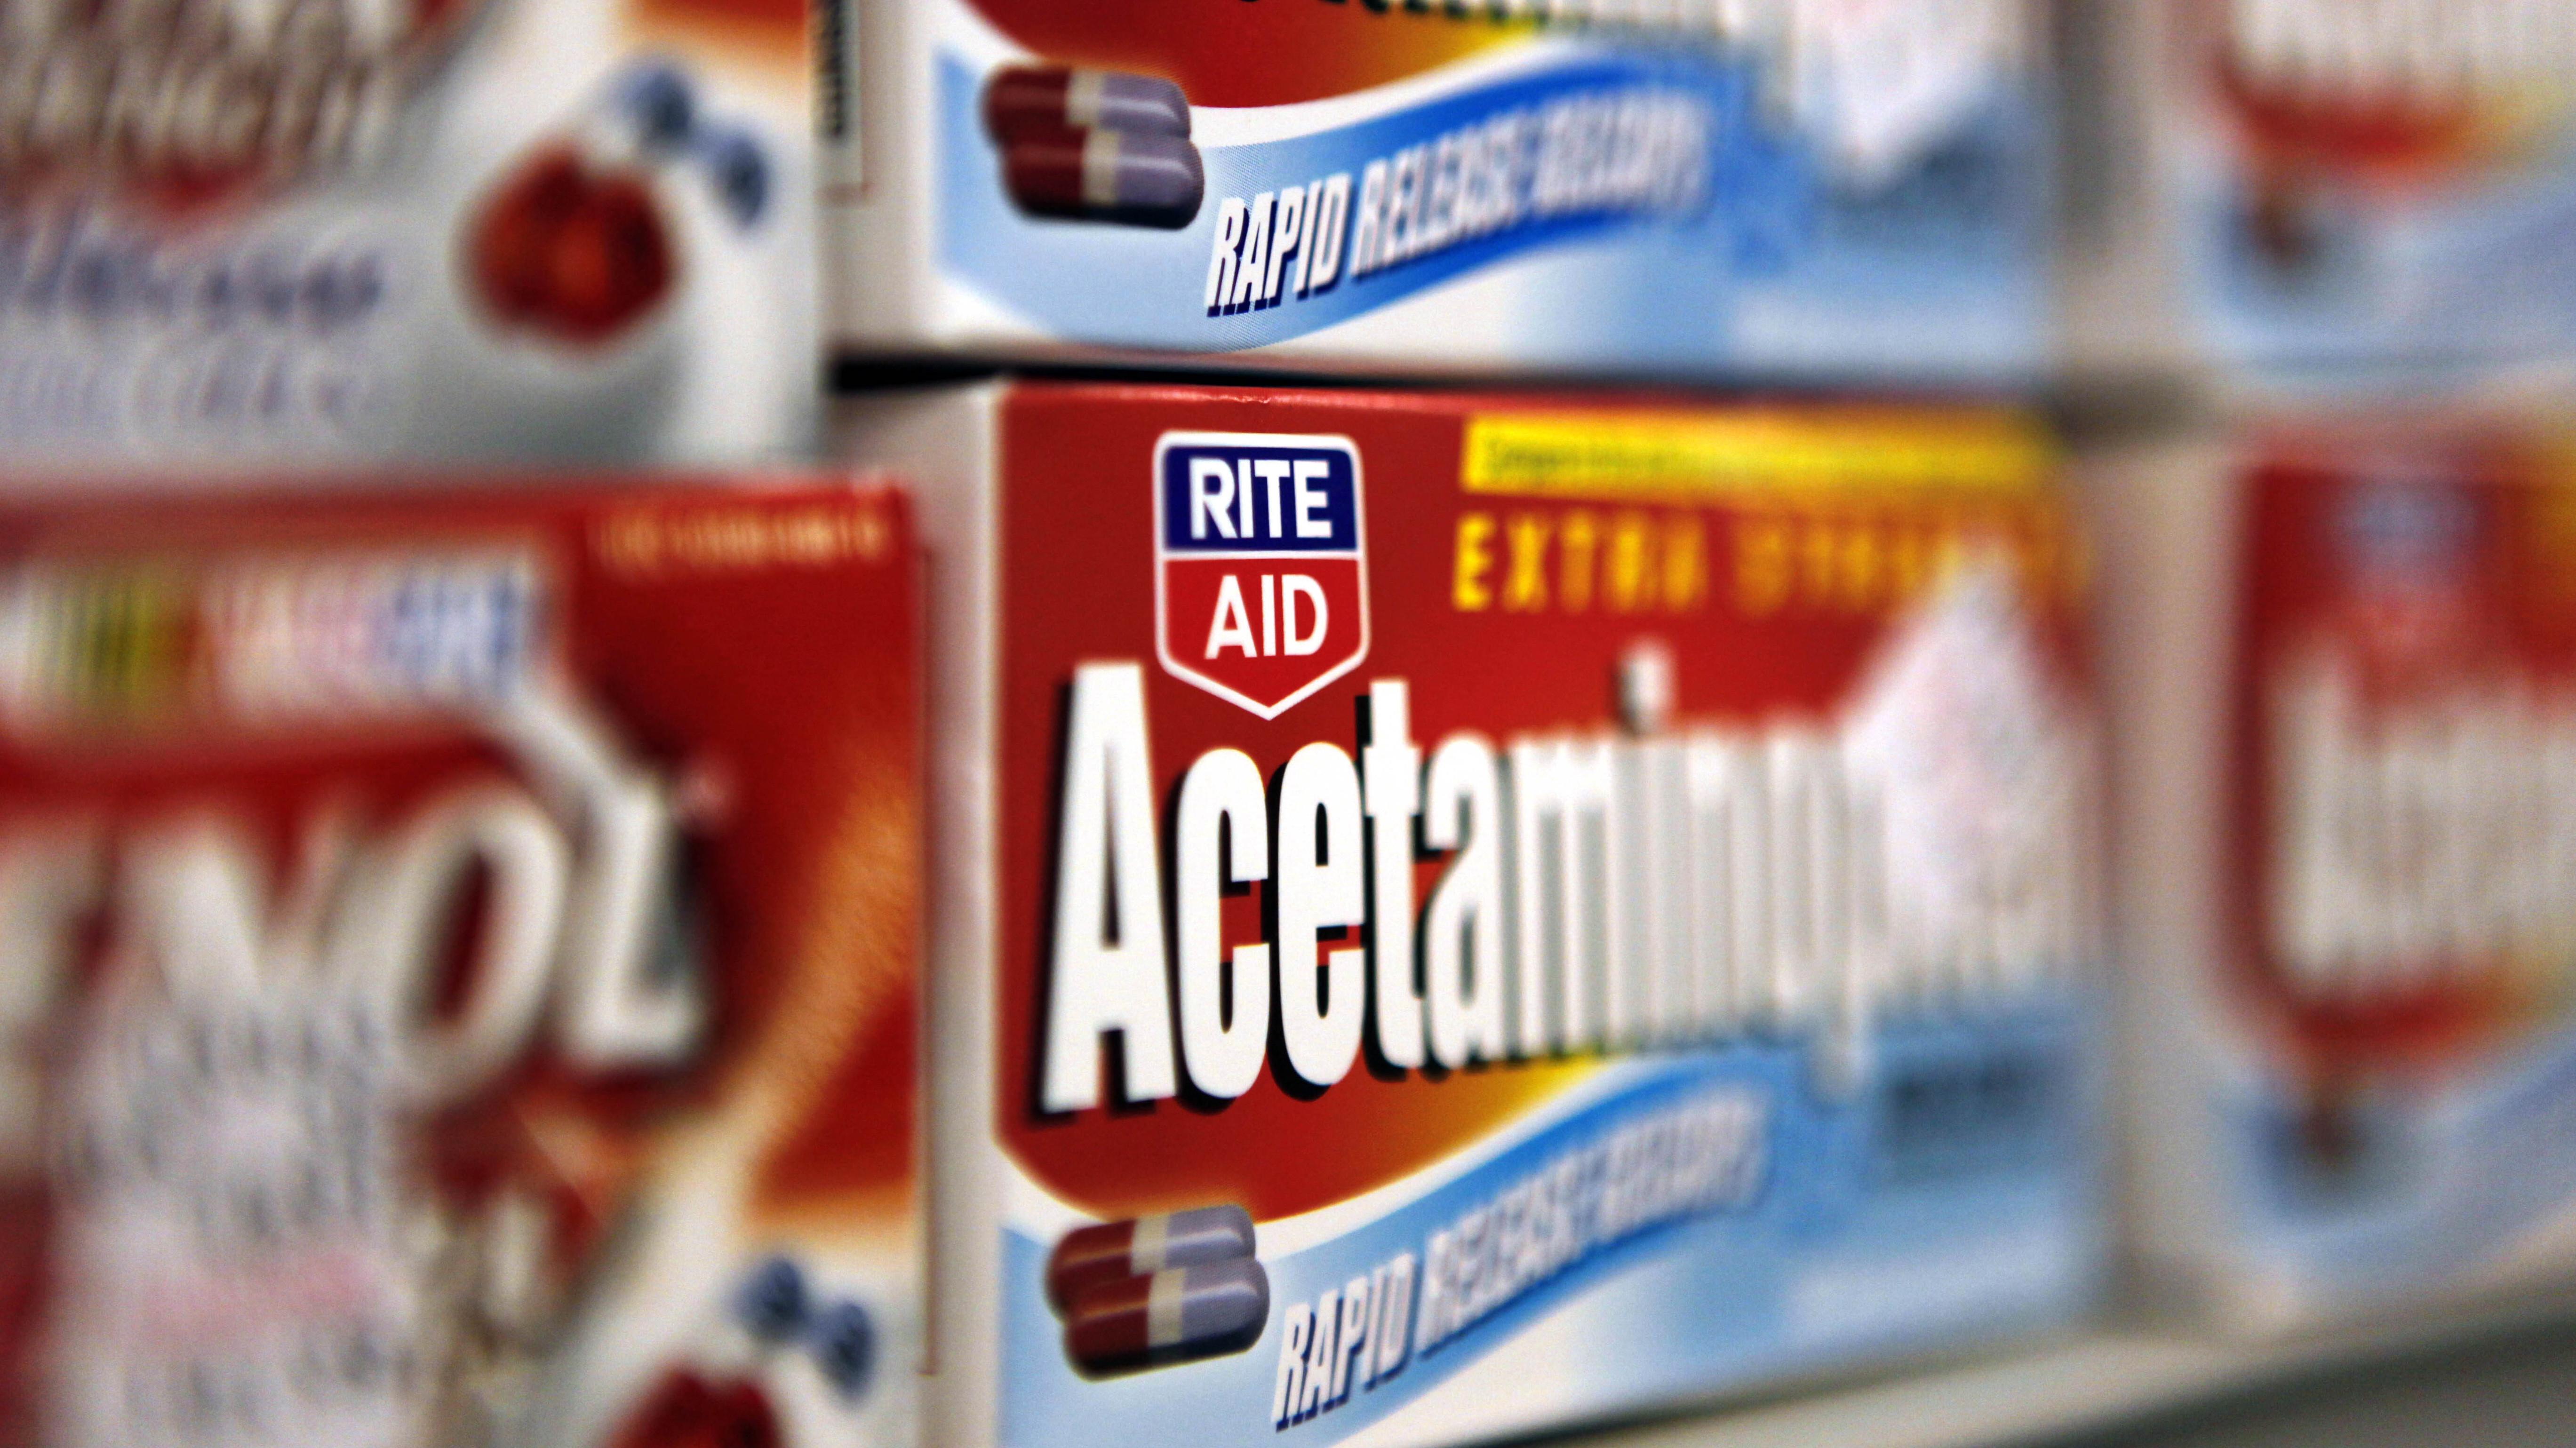 Acetaminophen Can Cause Rare, Serious Skin Disorders, FDA Warns